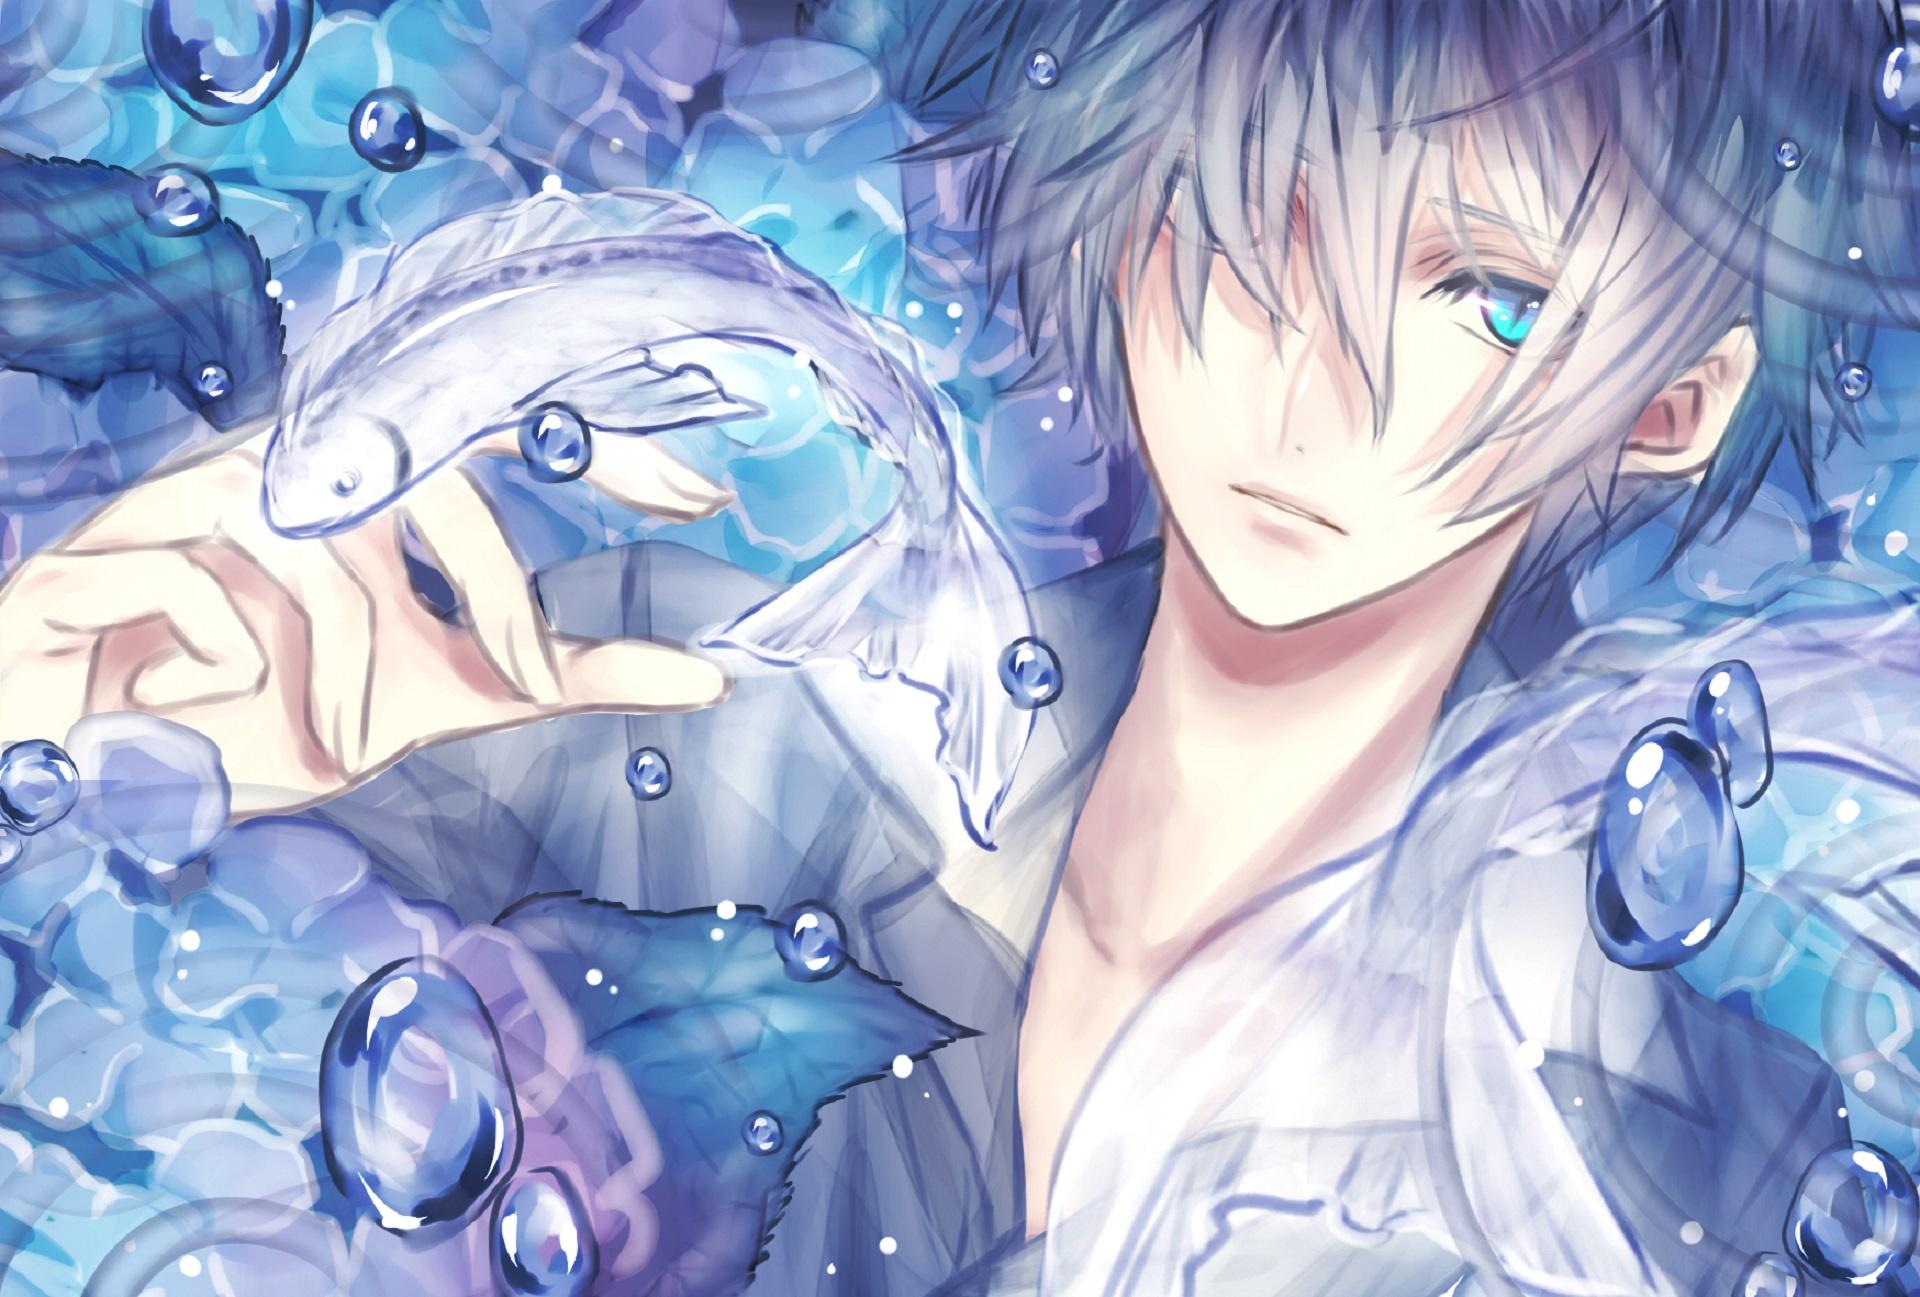 Wallpaper : anime boys, white hair, blue eyes, original ...